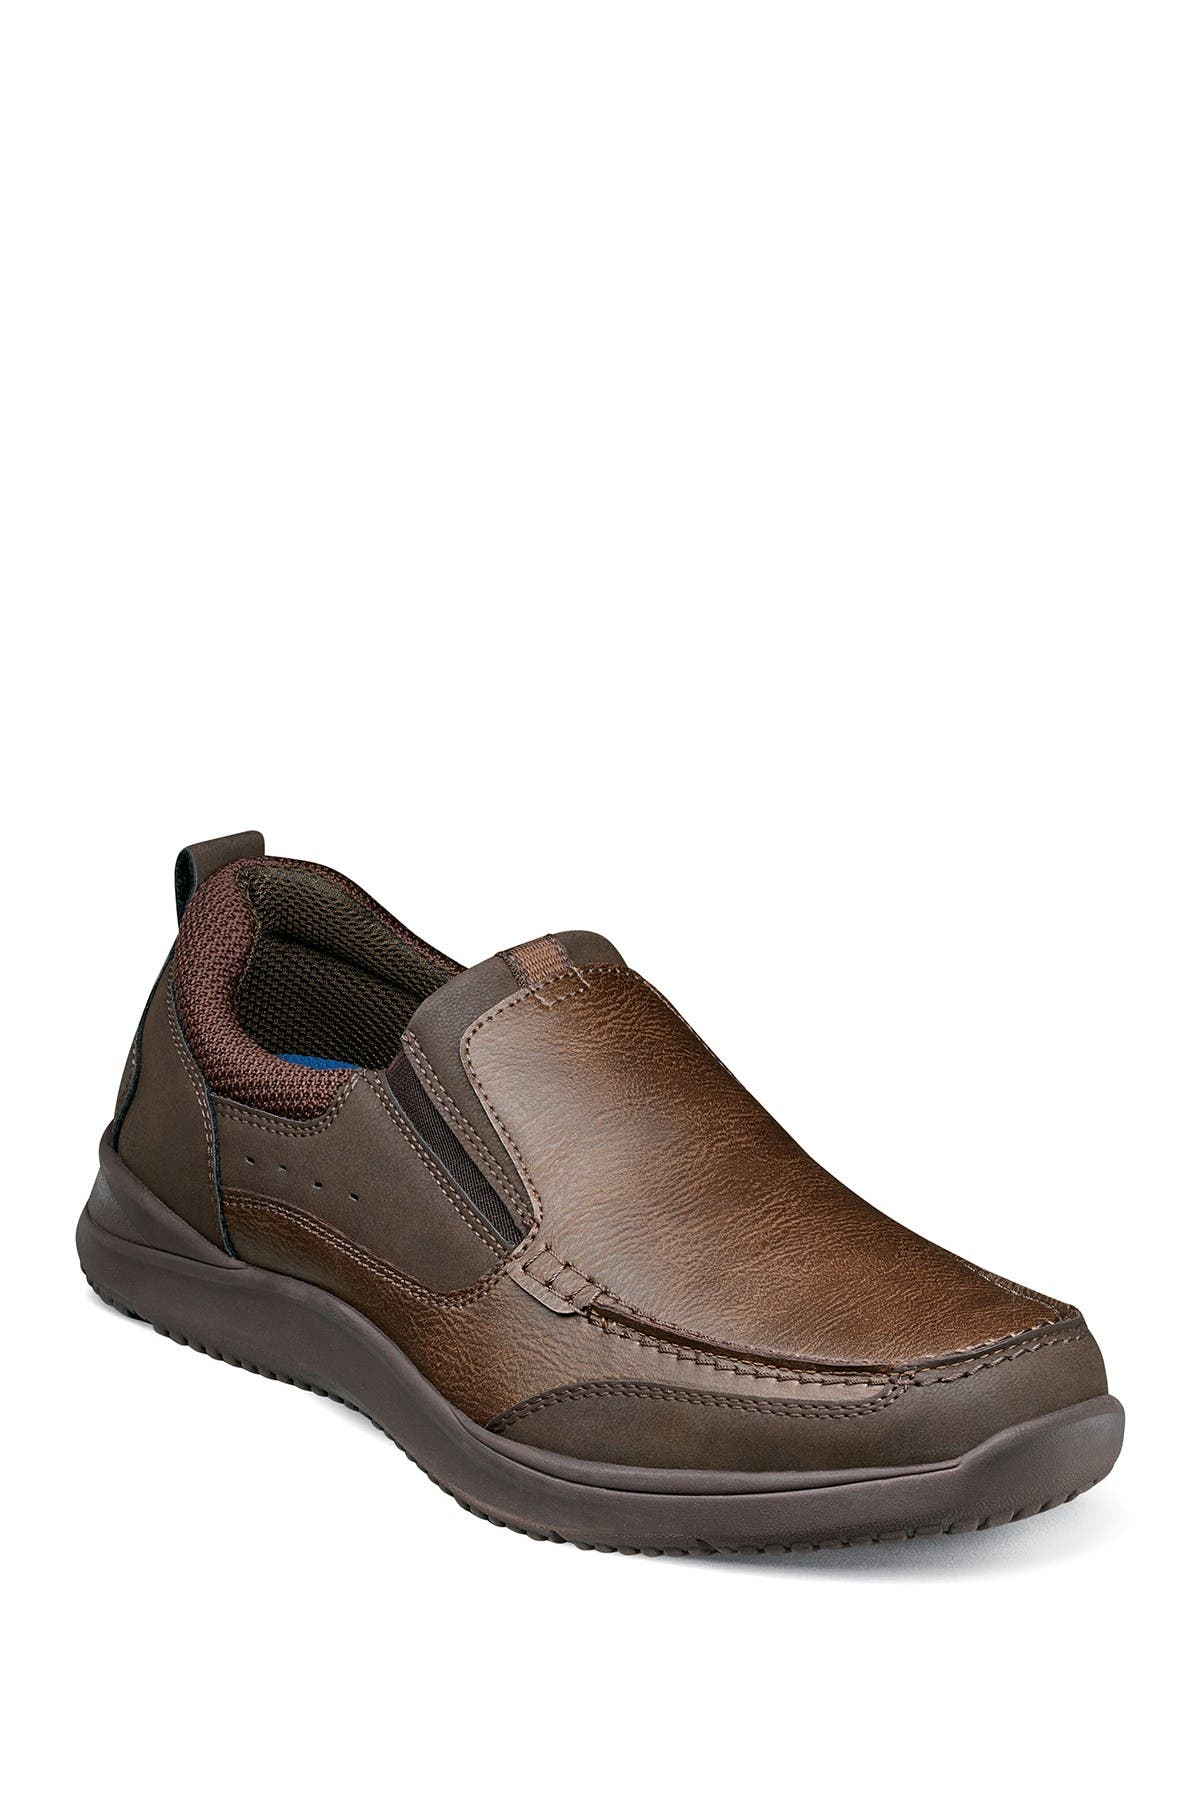 Image of NUNN BUSH Conway Moc Toe Slip-On Sneaker